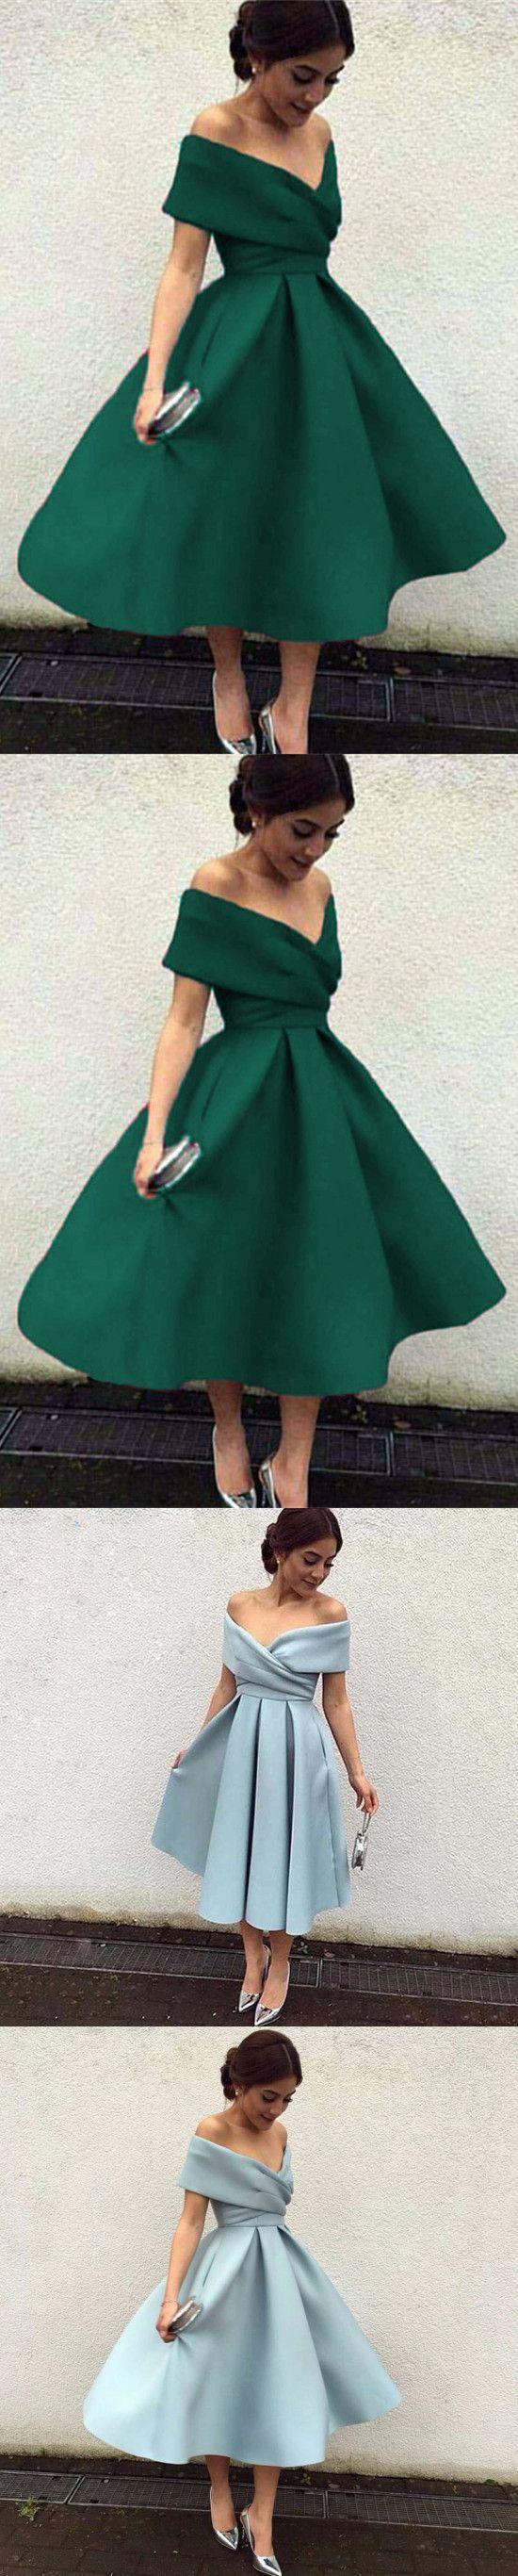 Short prom dressgreen prom dressoff shoulder prom gown m